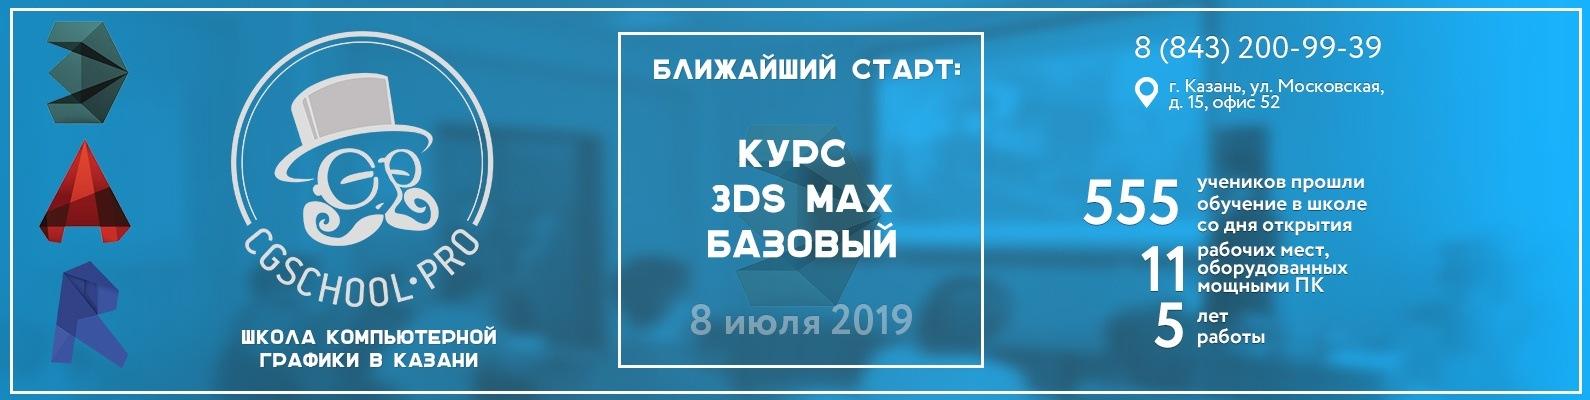 ef0f2b21a Обучение 3Ds Max, AutoCAD, Revit в Казани. | ВКонтакте